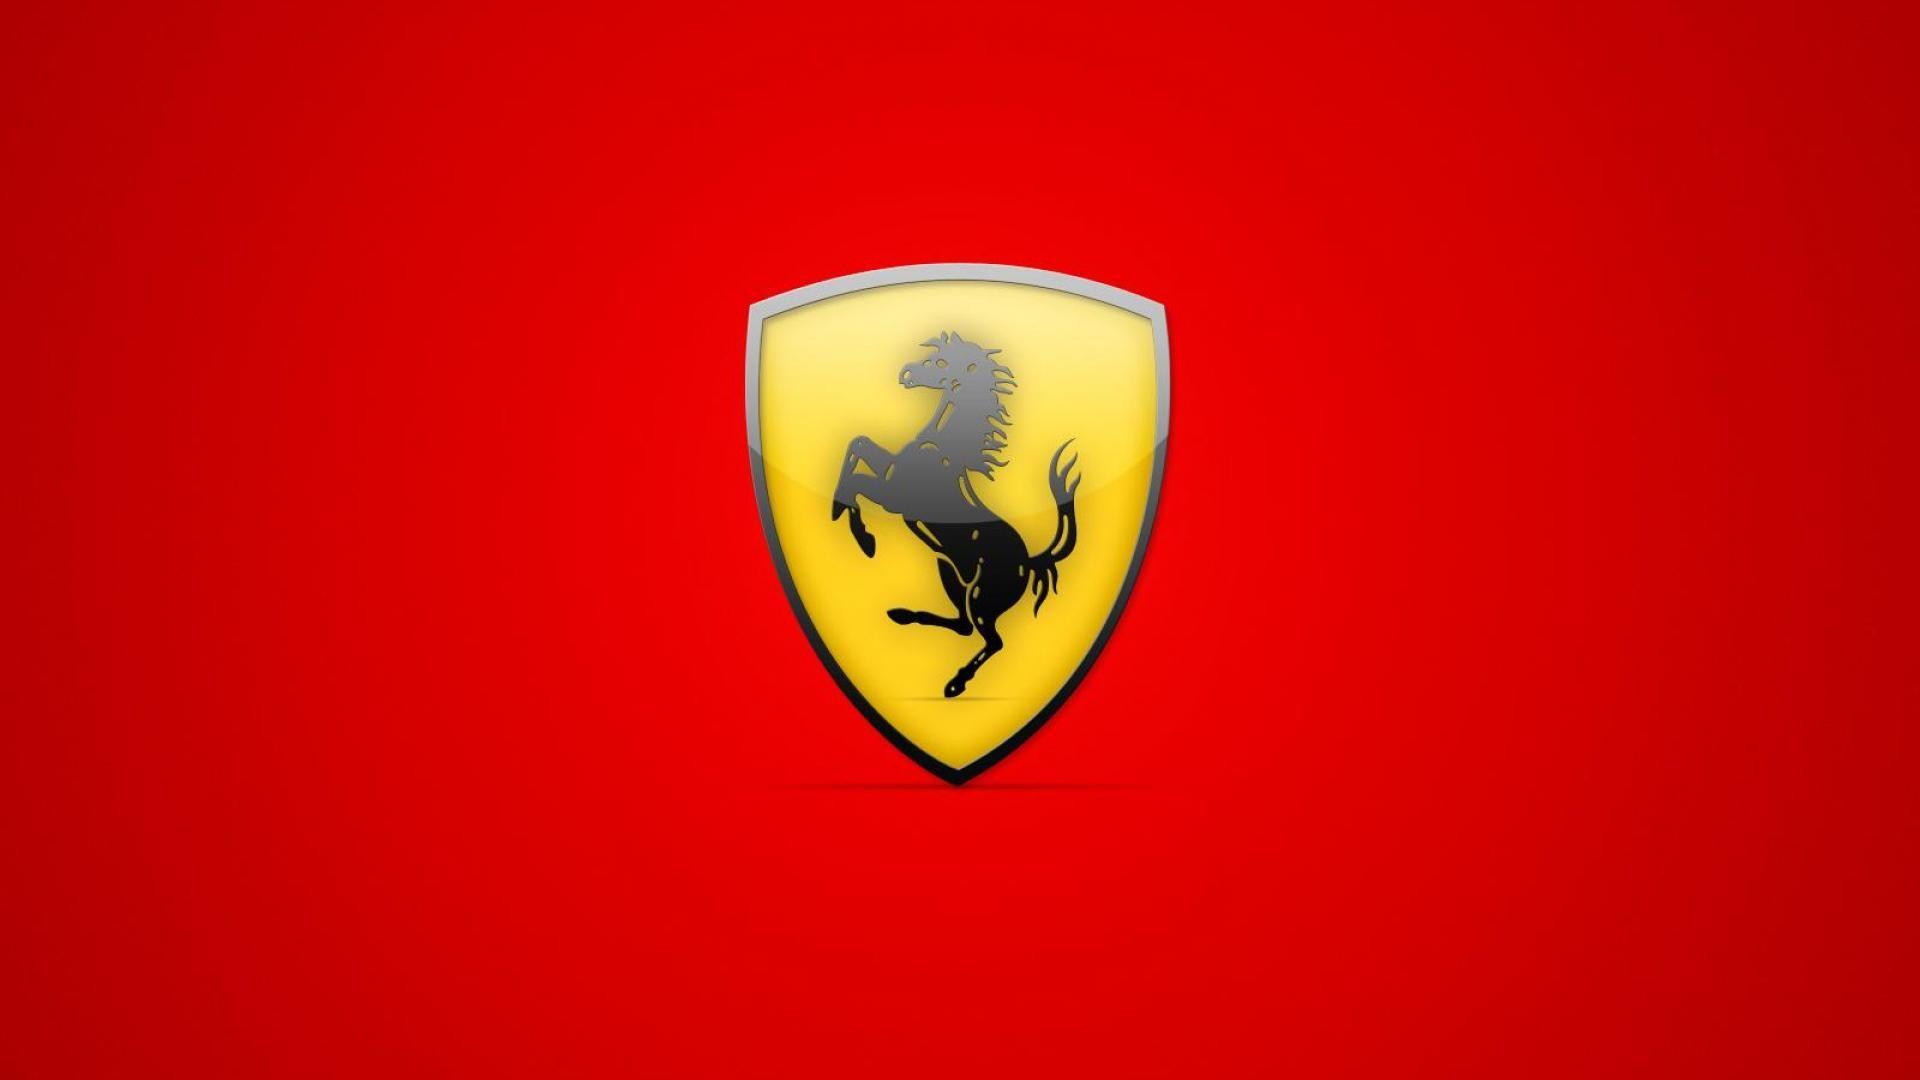 Scuderia Ferrari F1 Team Ferrari/Scuderia Pinterest